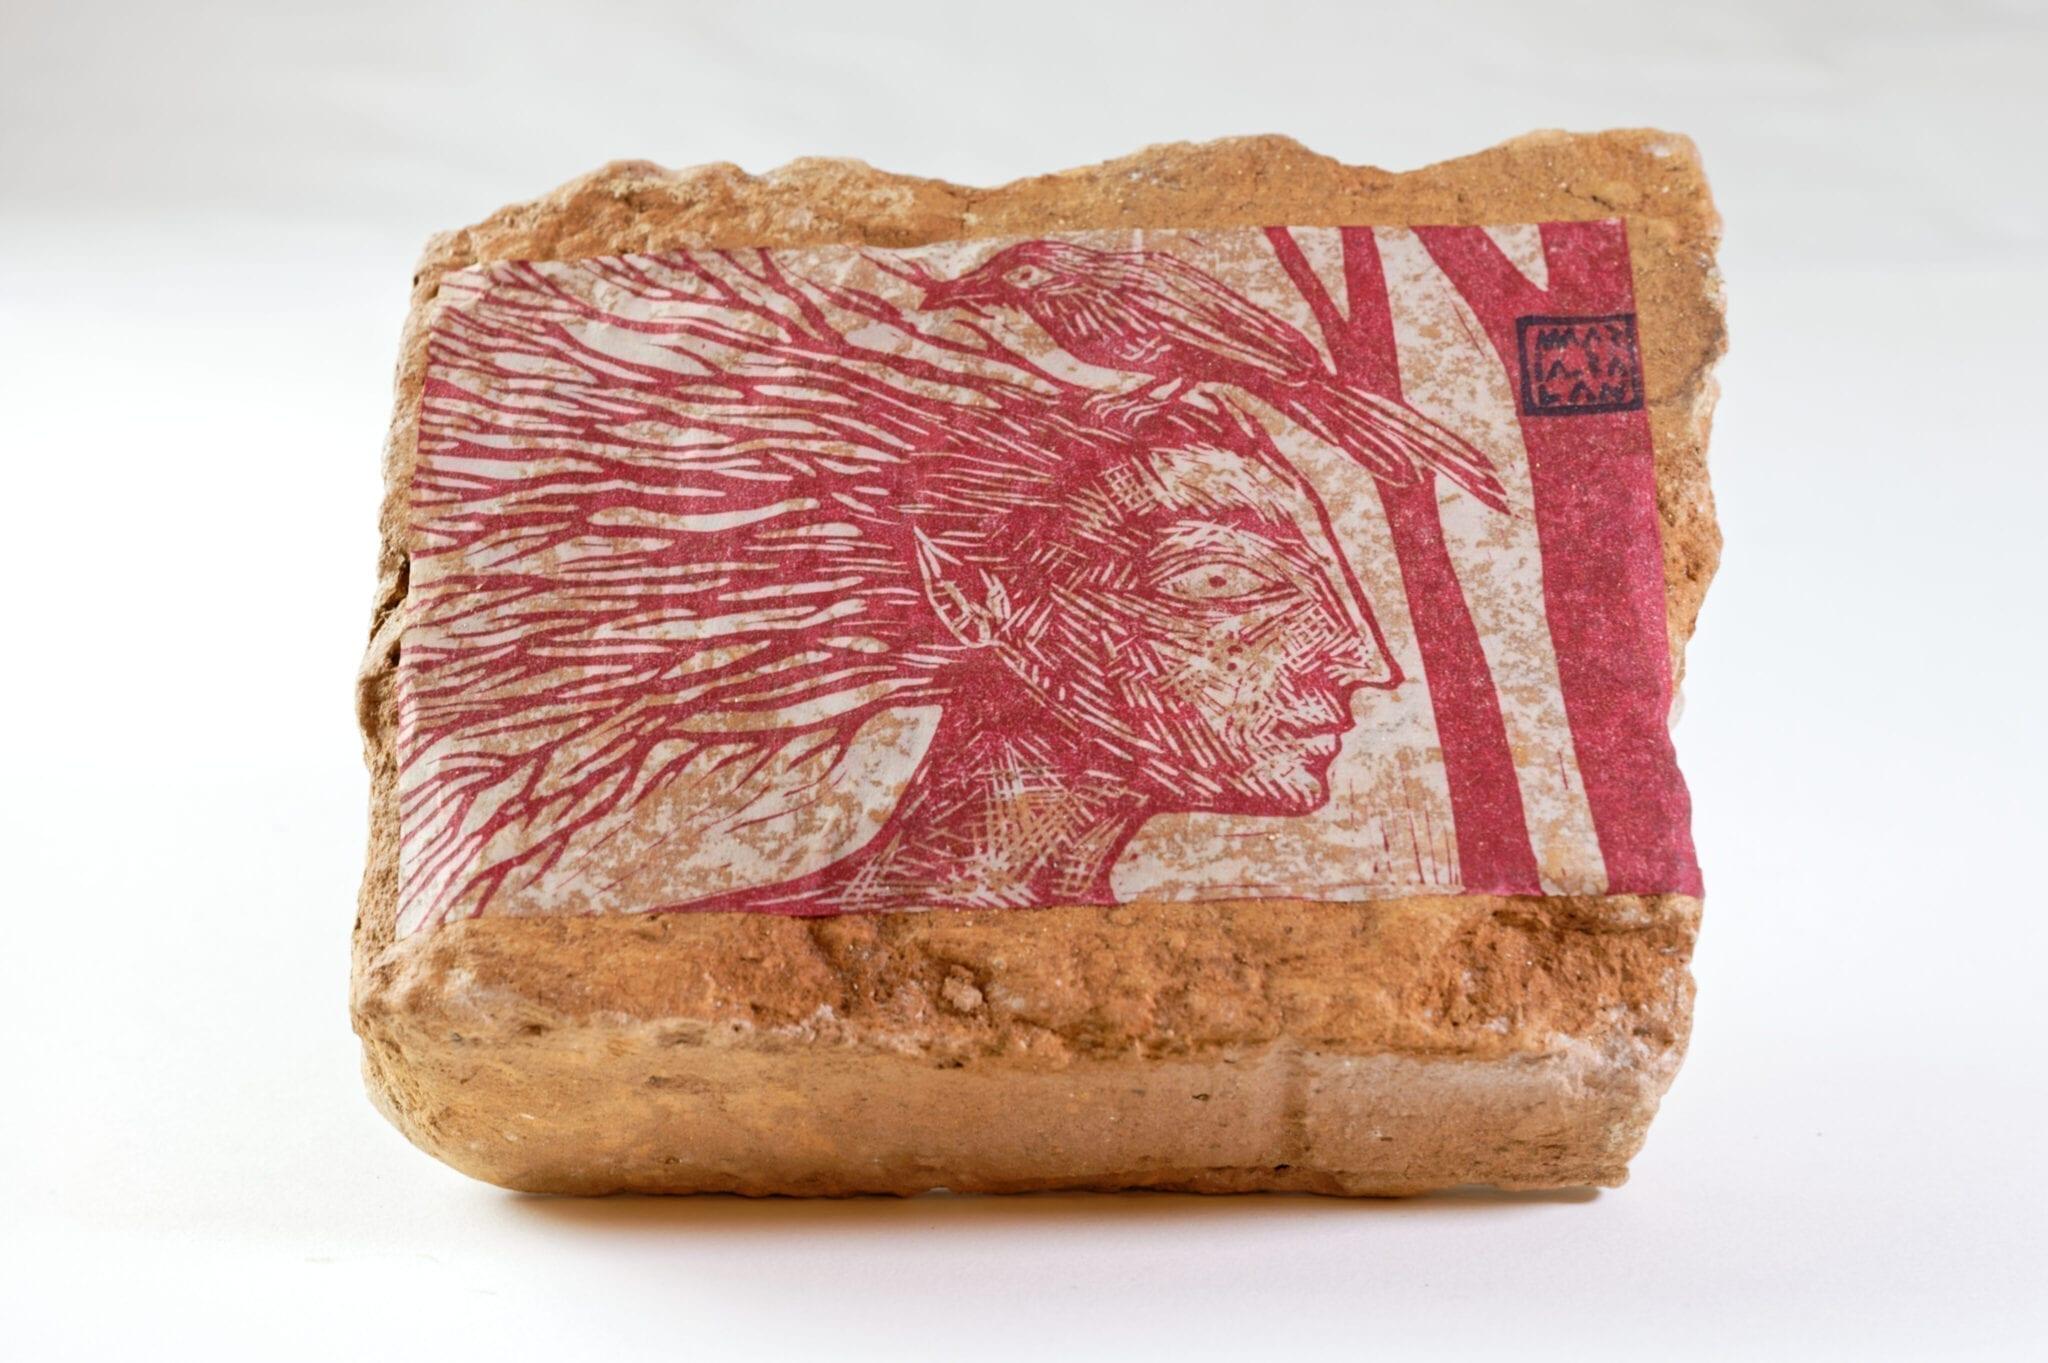 Maria Bălan - Forest Spirit / linocut paste-up on reclaimed brick